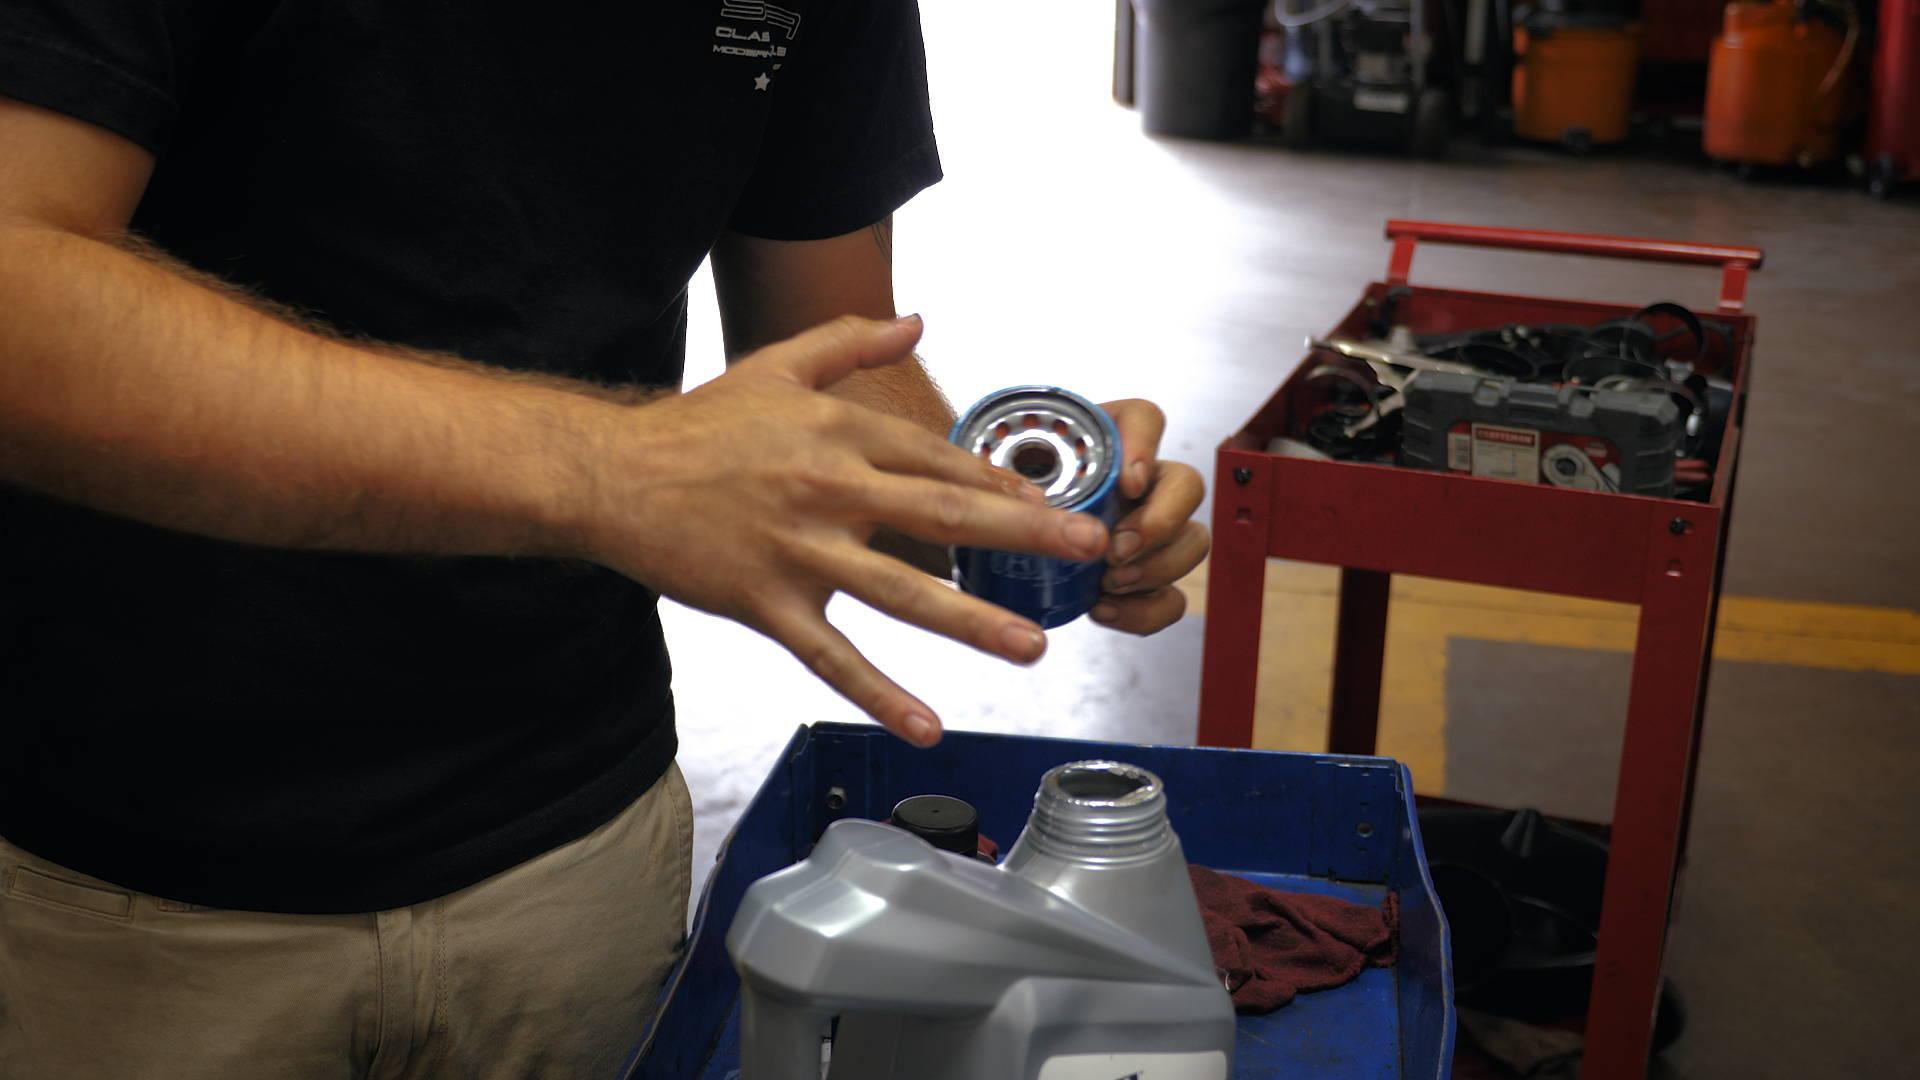 Oil Change - Applying Bead Of Oil To Filter Gasket Honda Civic